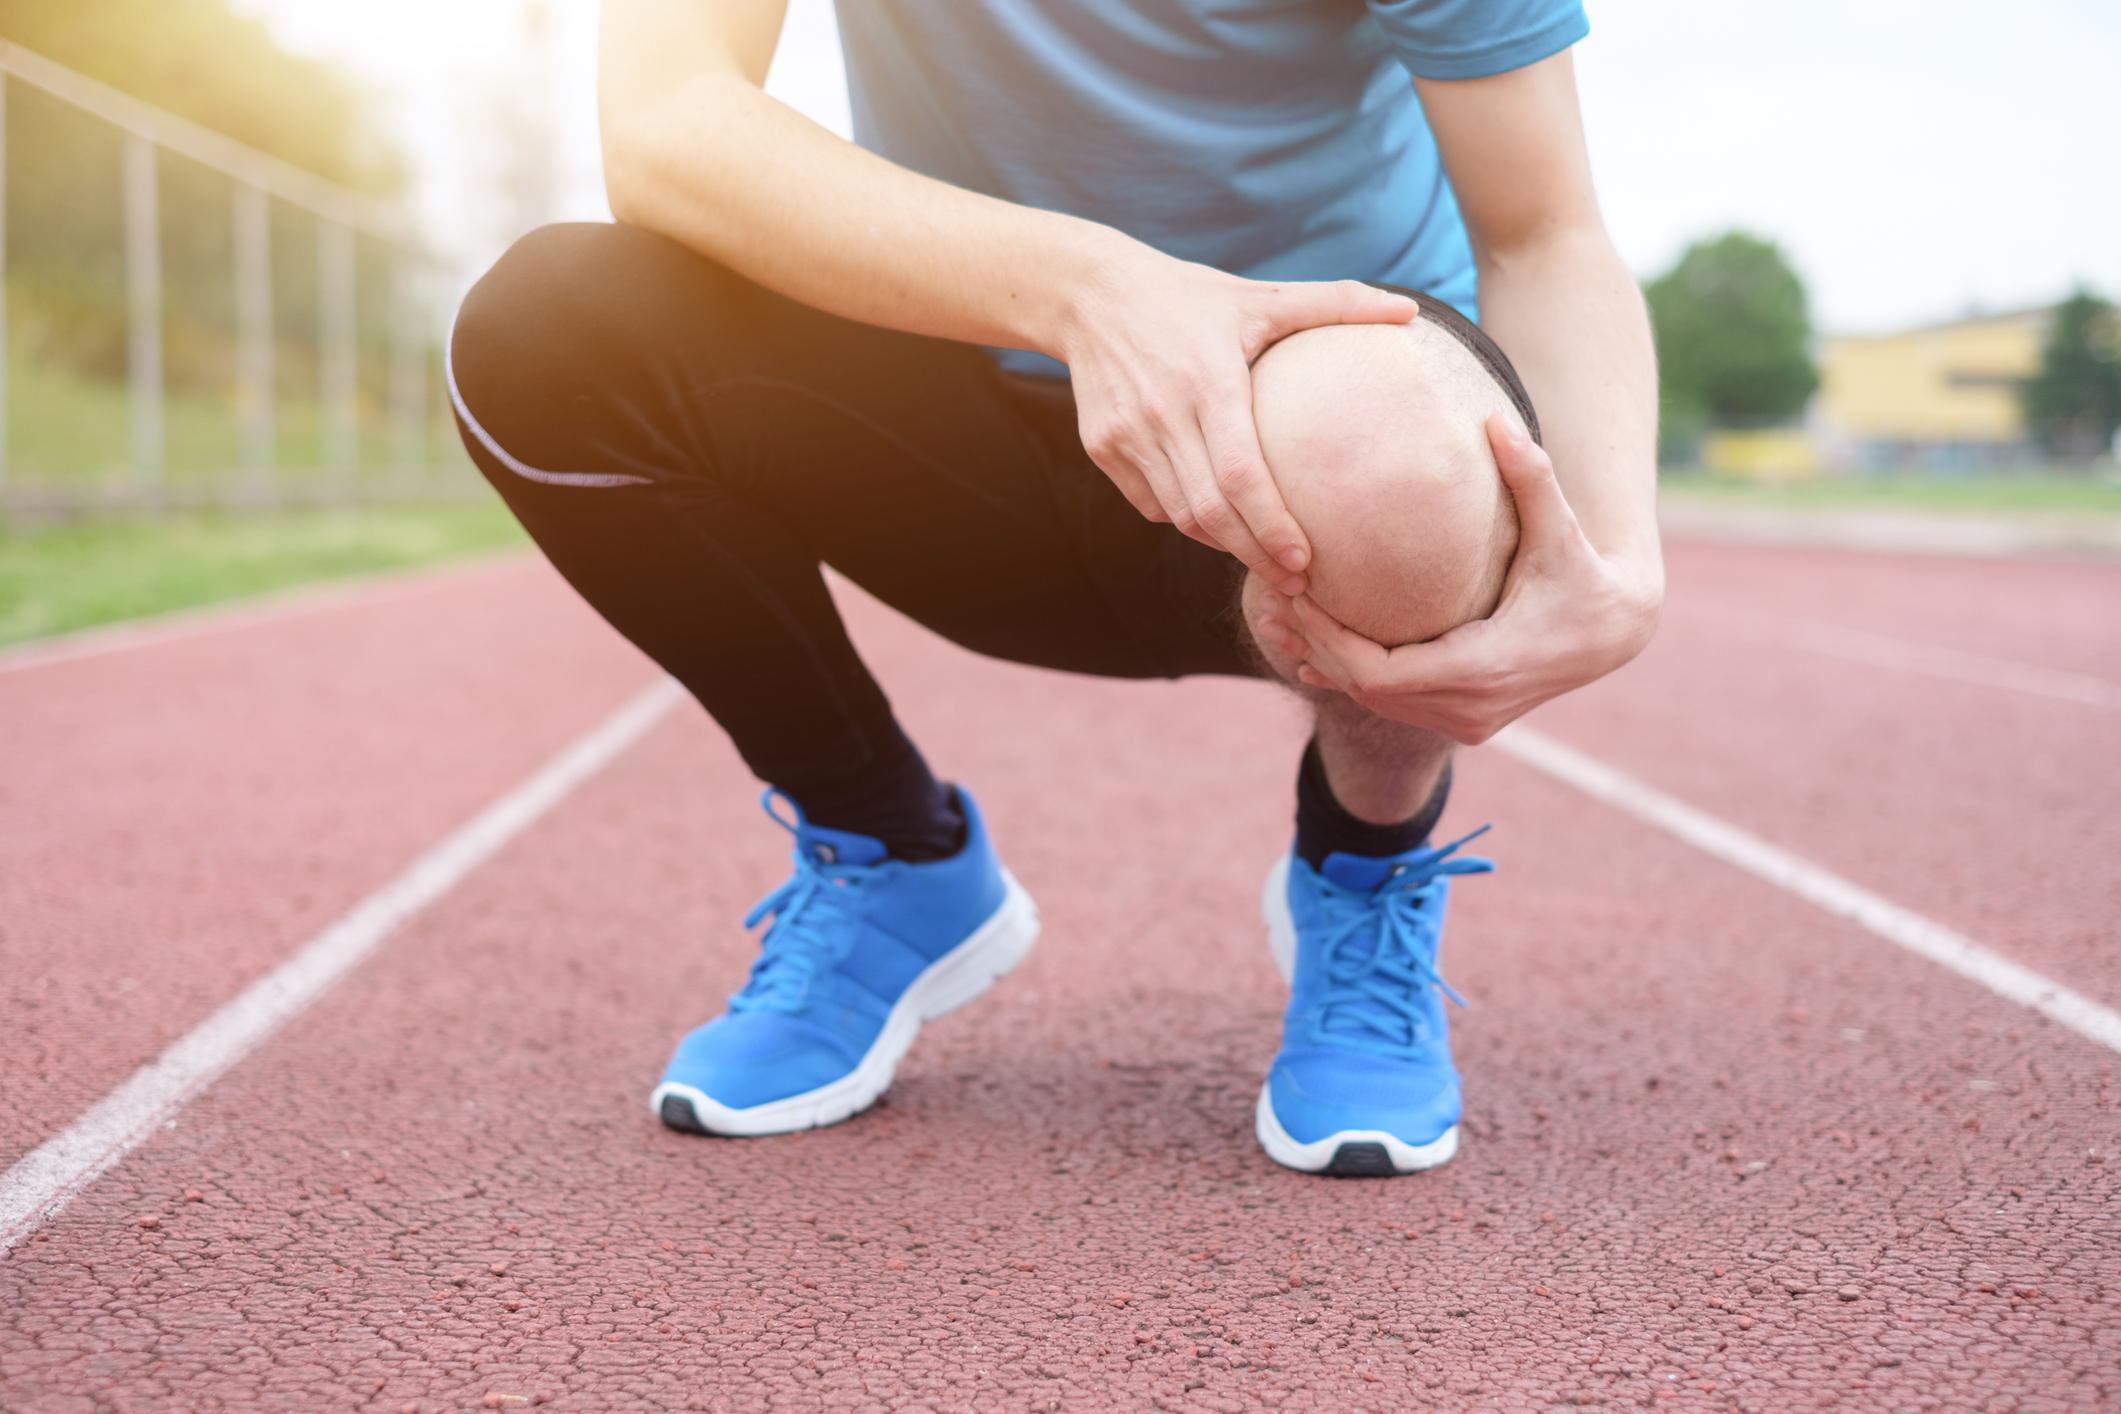 From Athletics to Arthritis: Osteoarthritis at Age 28